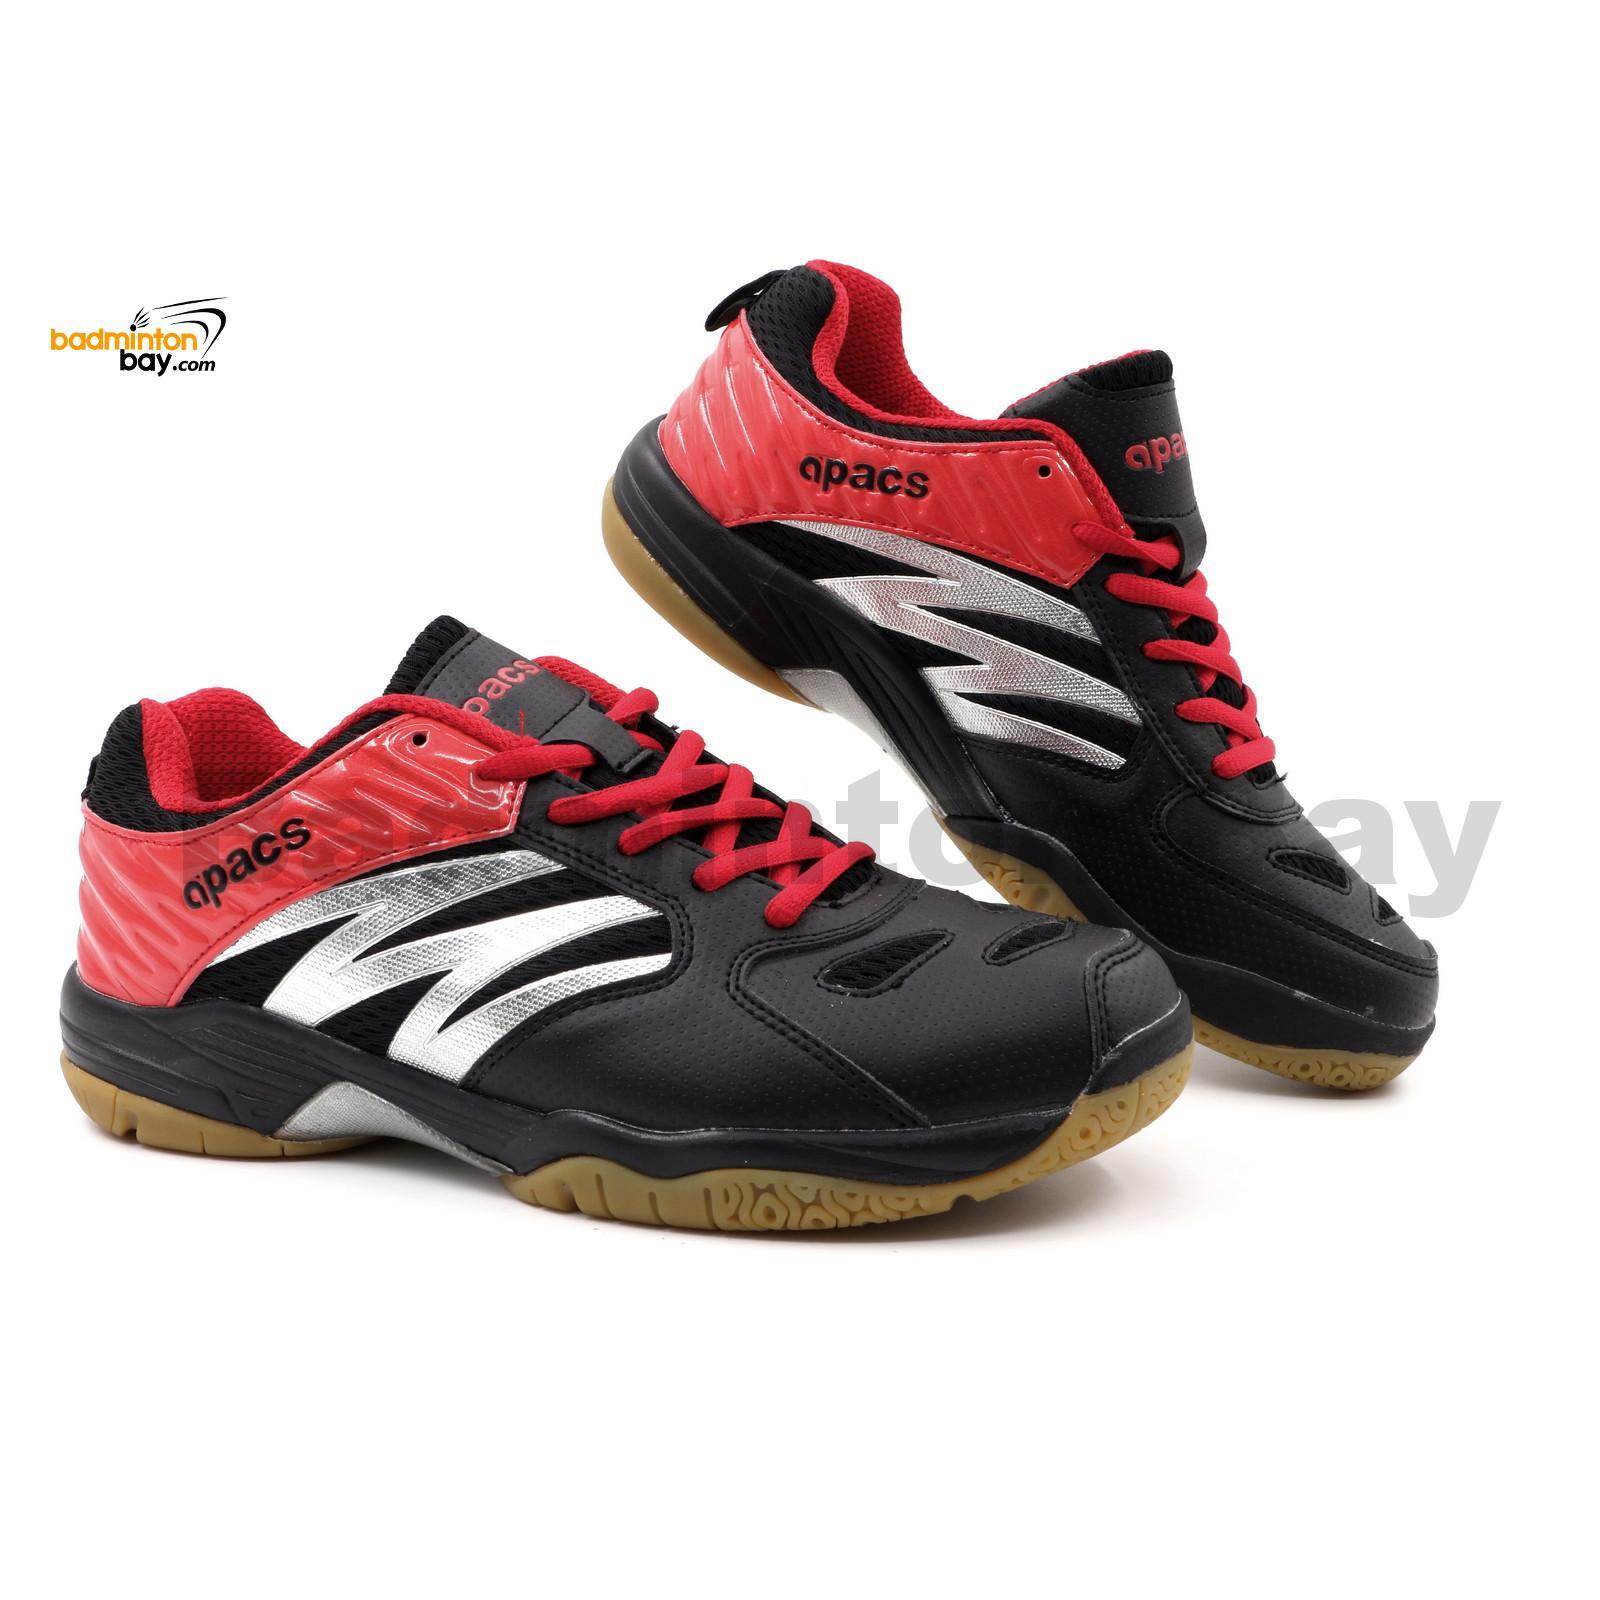 Apacs Cushion Power Sp 601 Black Red Badminton Shoes Sporting Goods Footwear